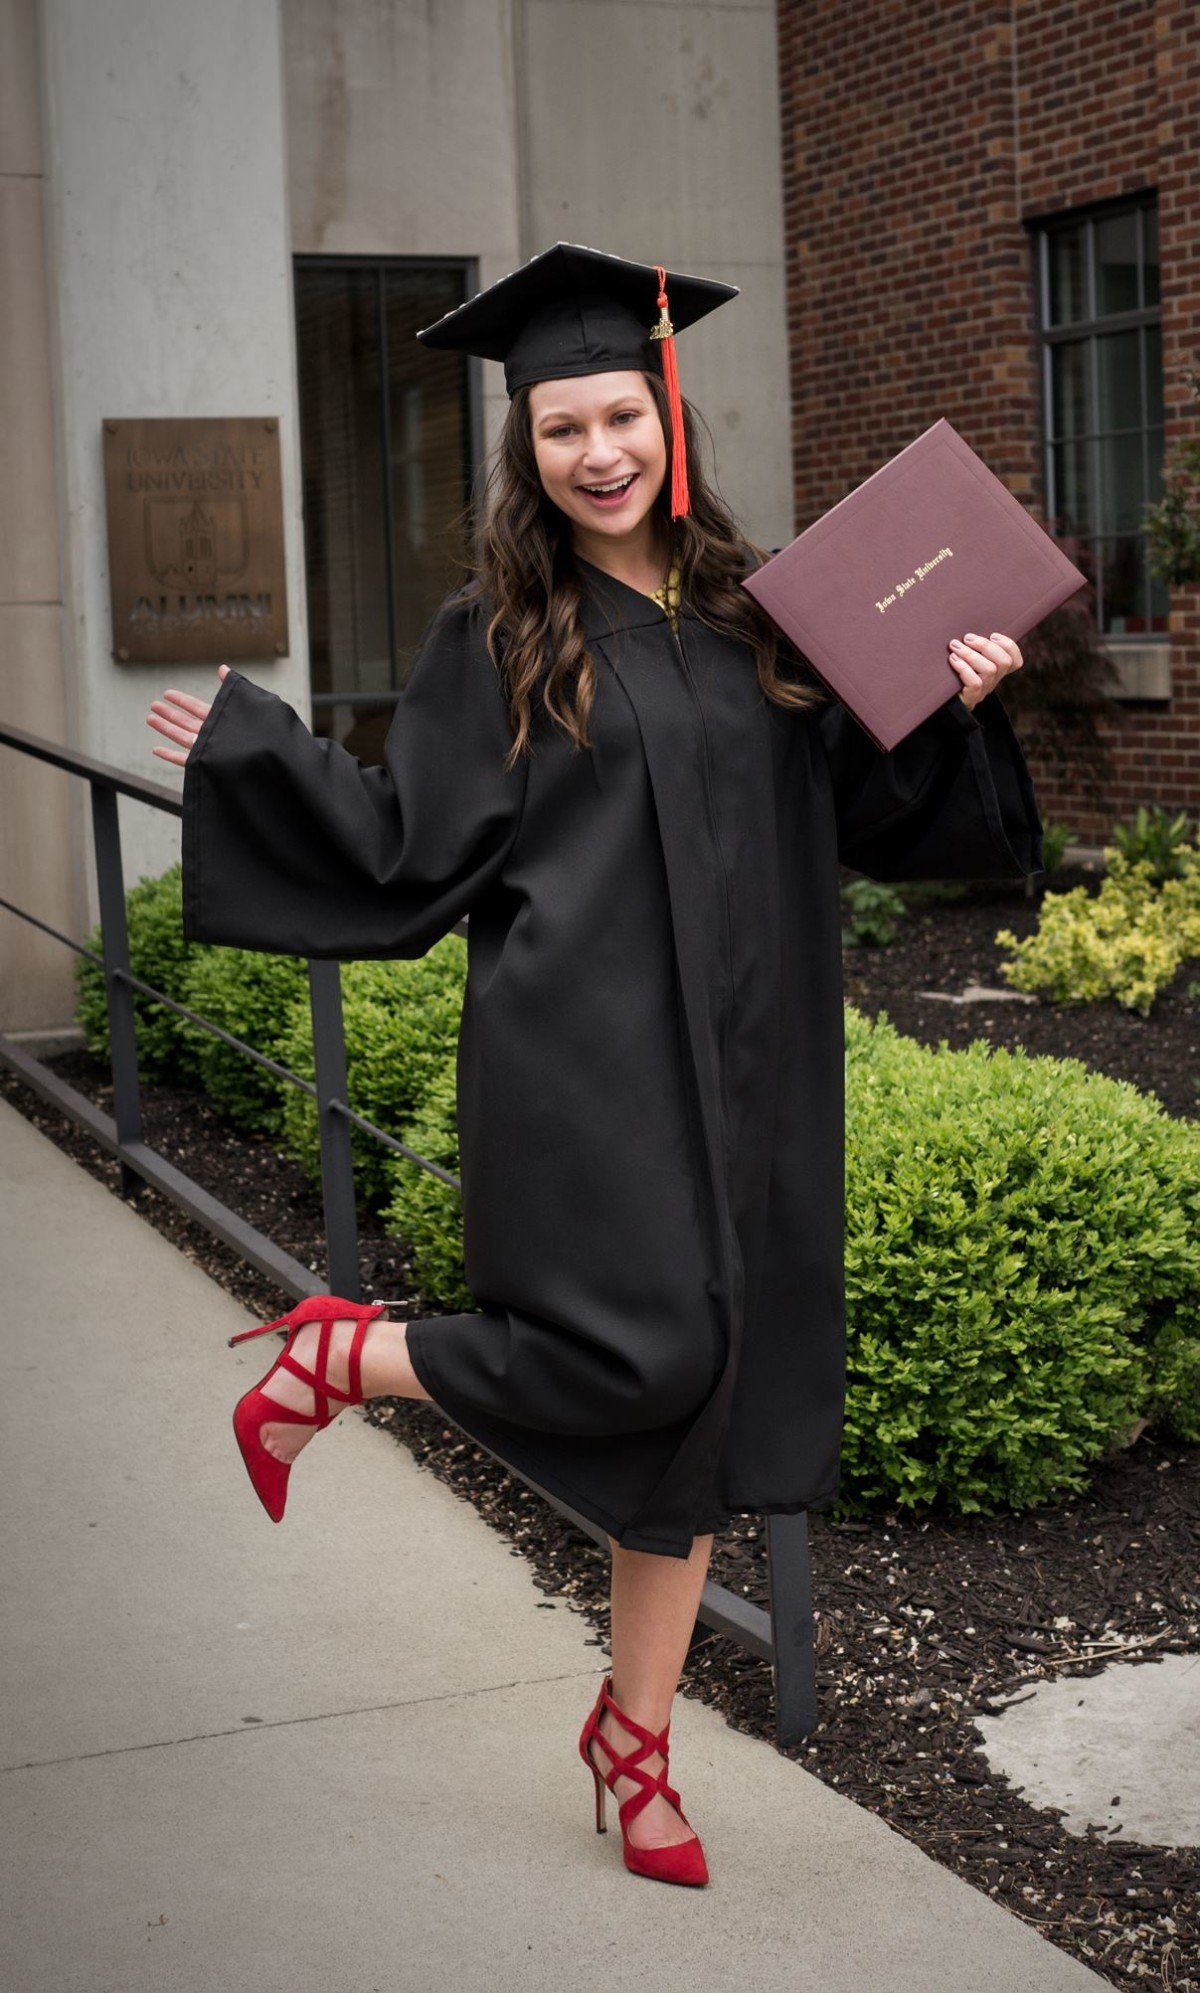 Life Update: Graduation